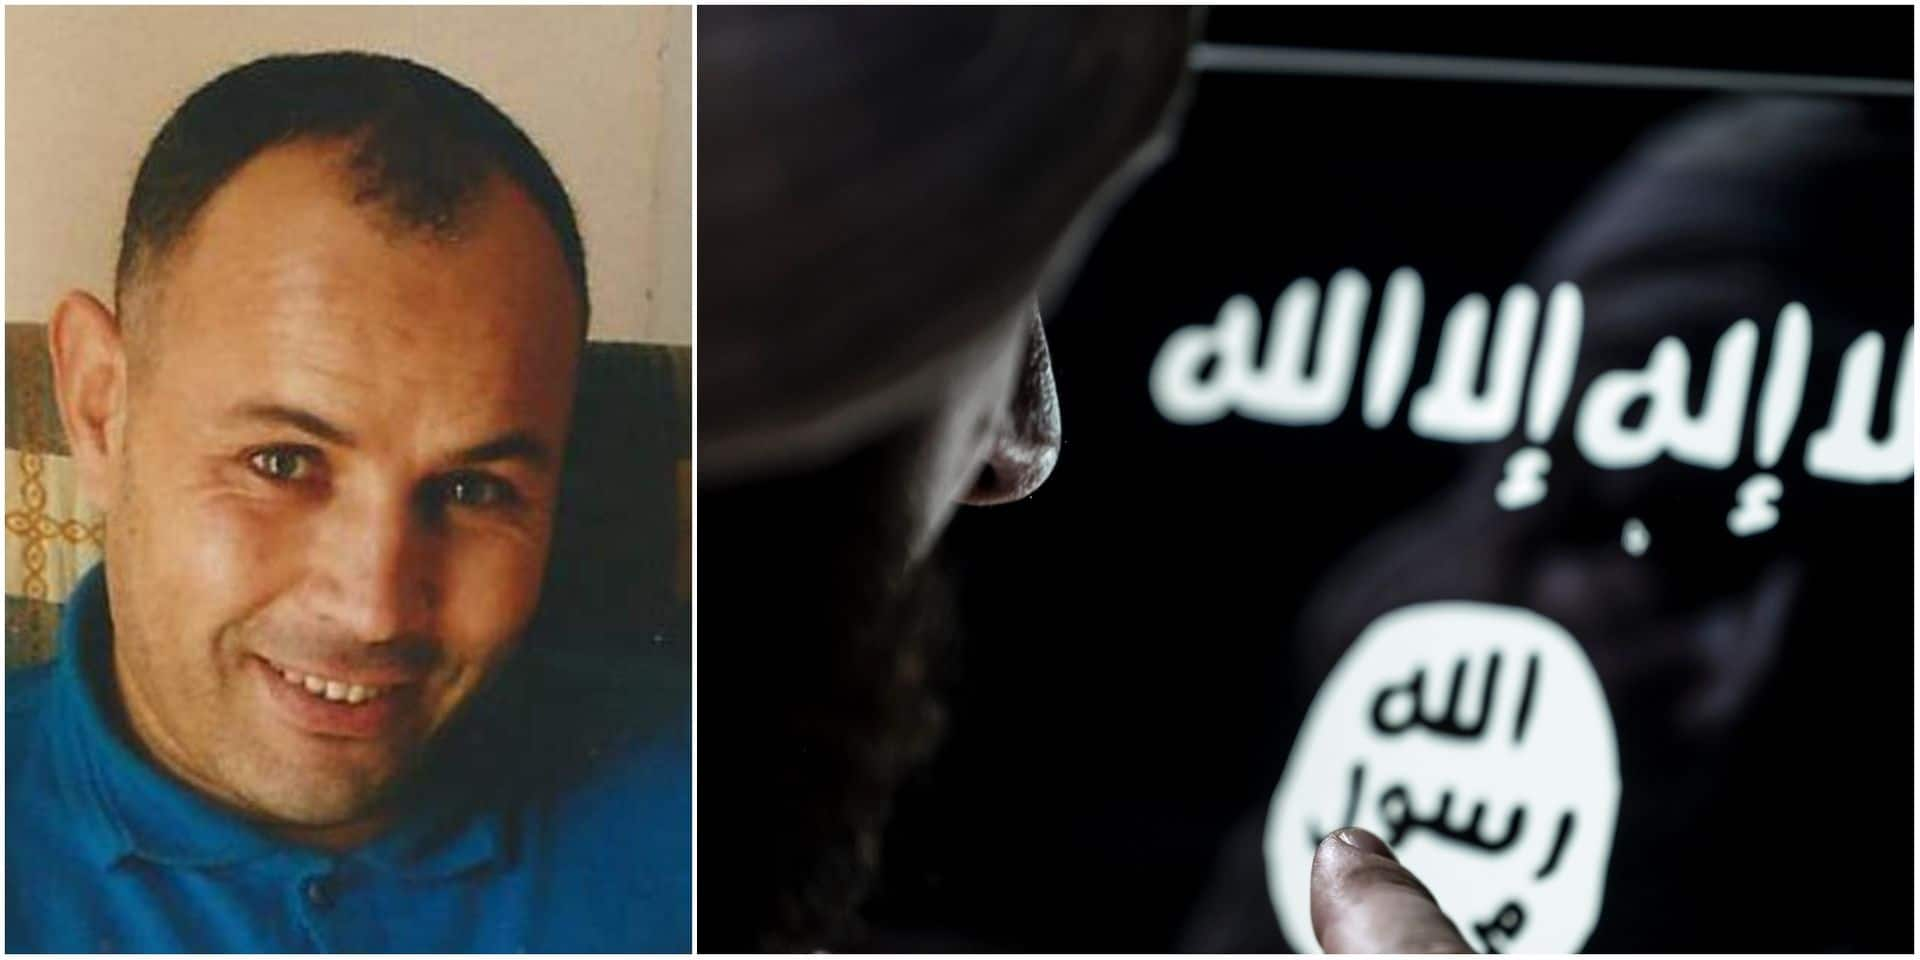 Le Belgo-Marocain Ali Aarrass victime d'accusations graves de terrorisme